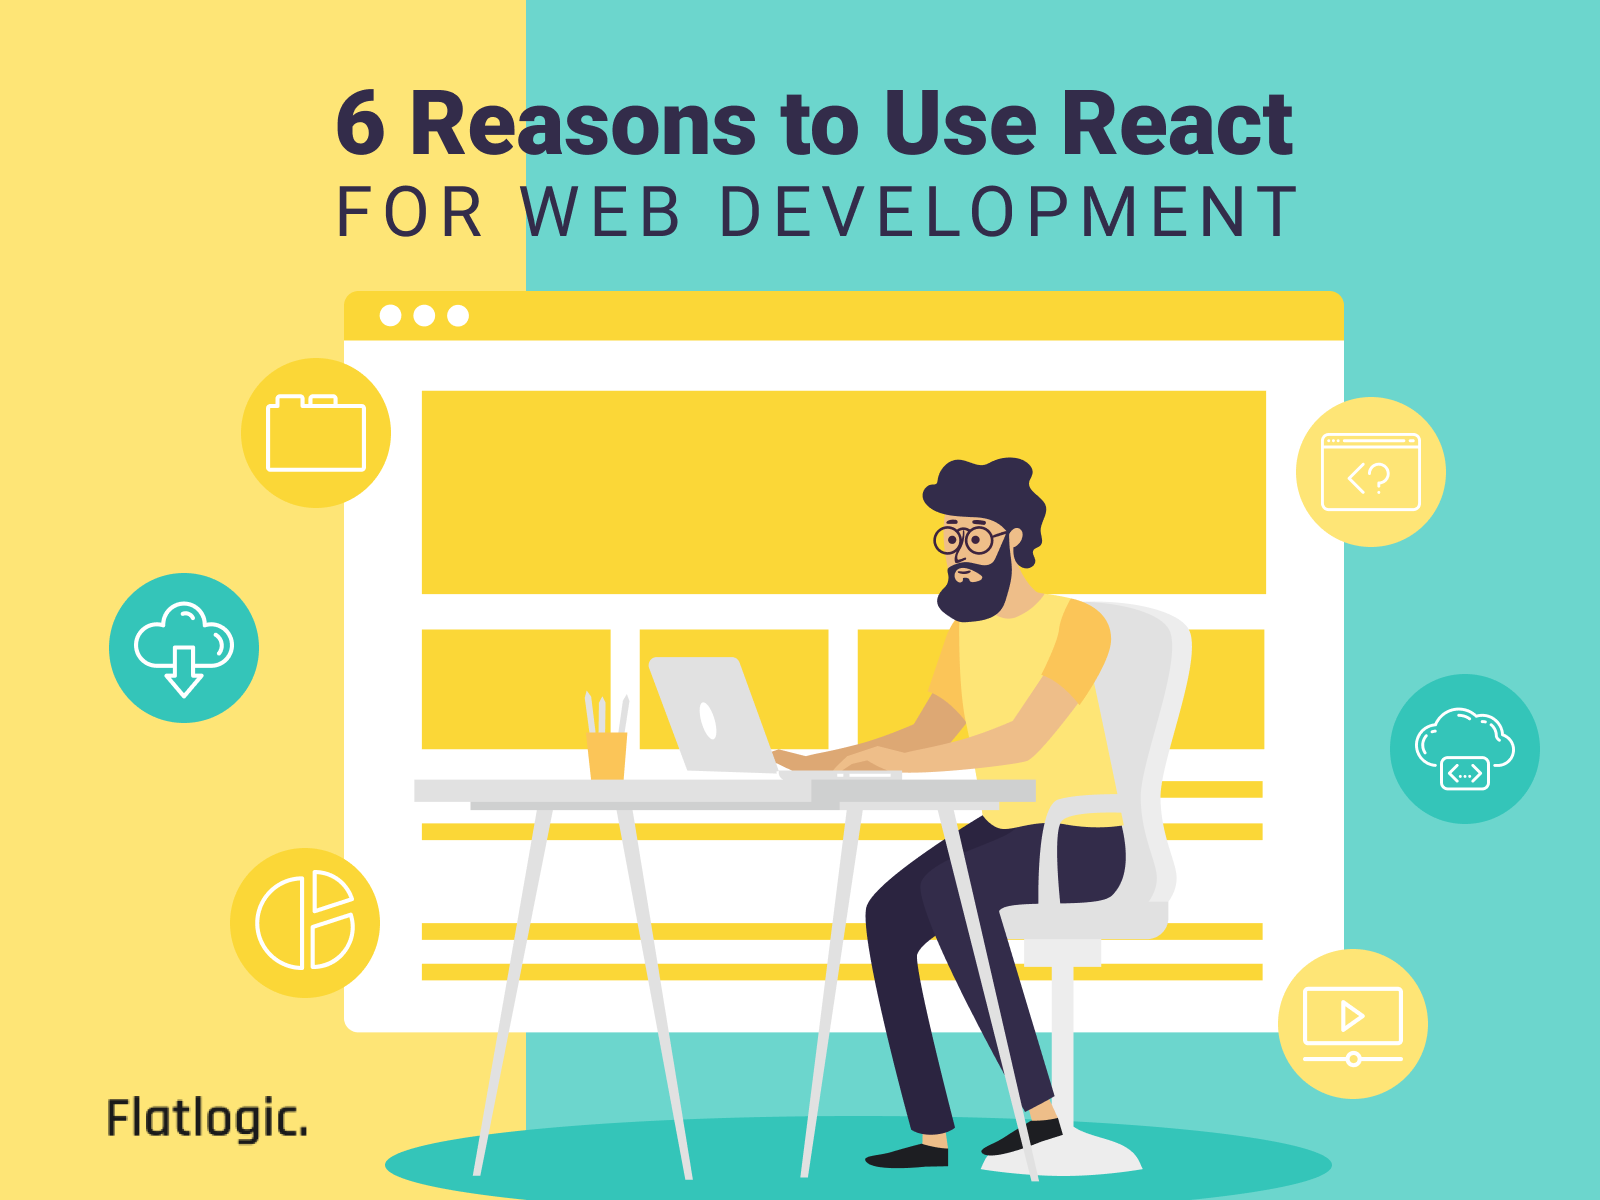 6 Reasons to Use ReactJS for Web Development